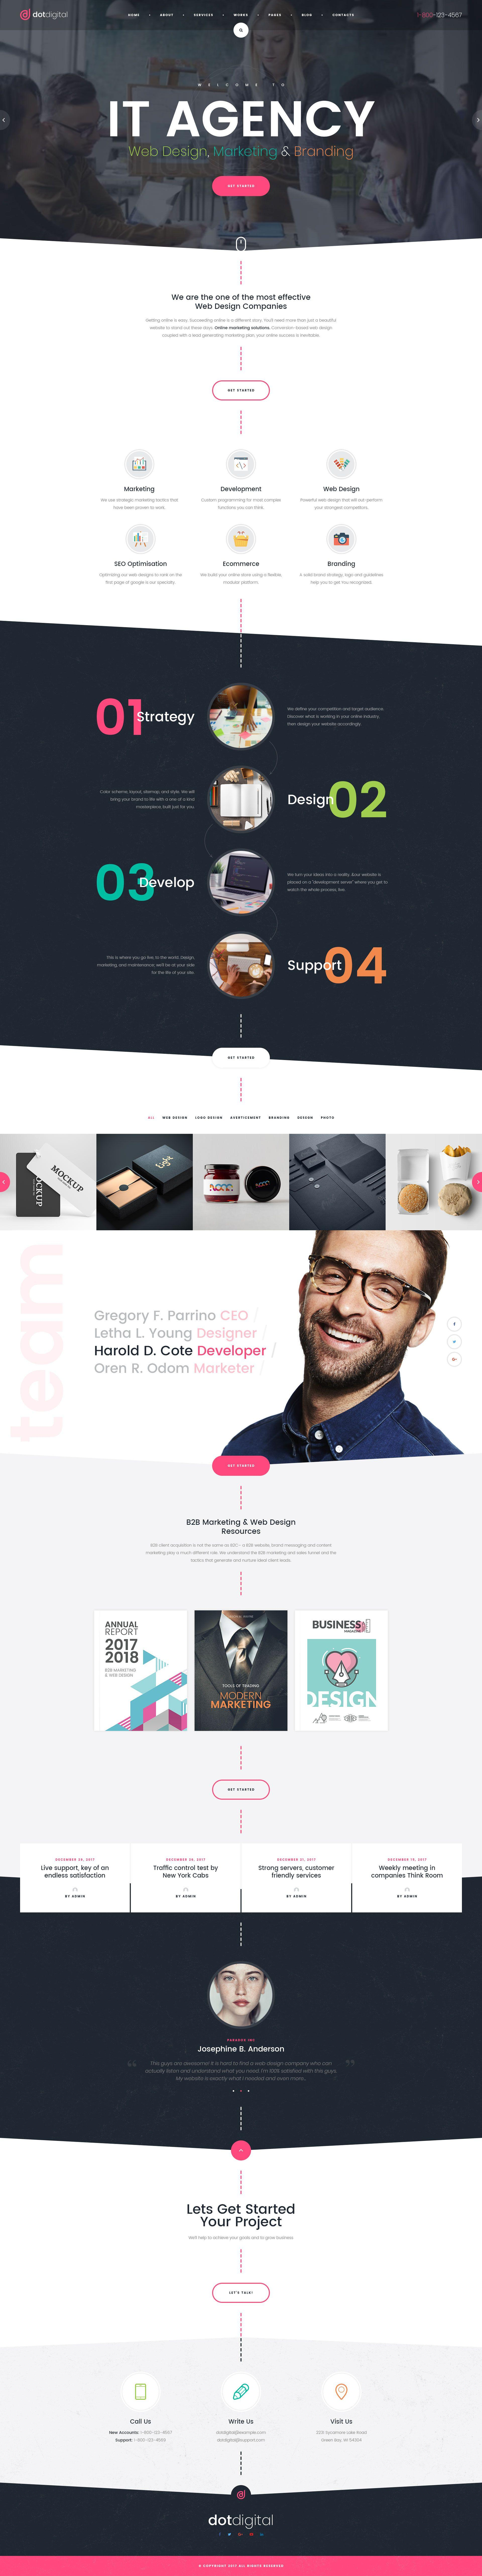 Dotdigital A 20web Design Agency Psd Template Design Web Dotdigital Template Web Design Agency Web Design Psd Templates